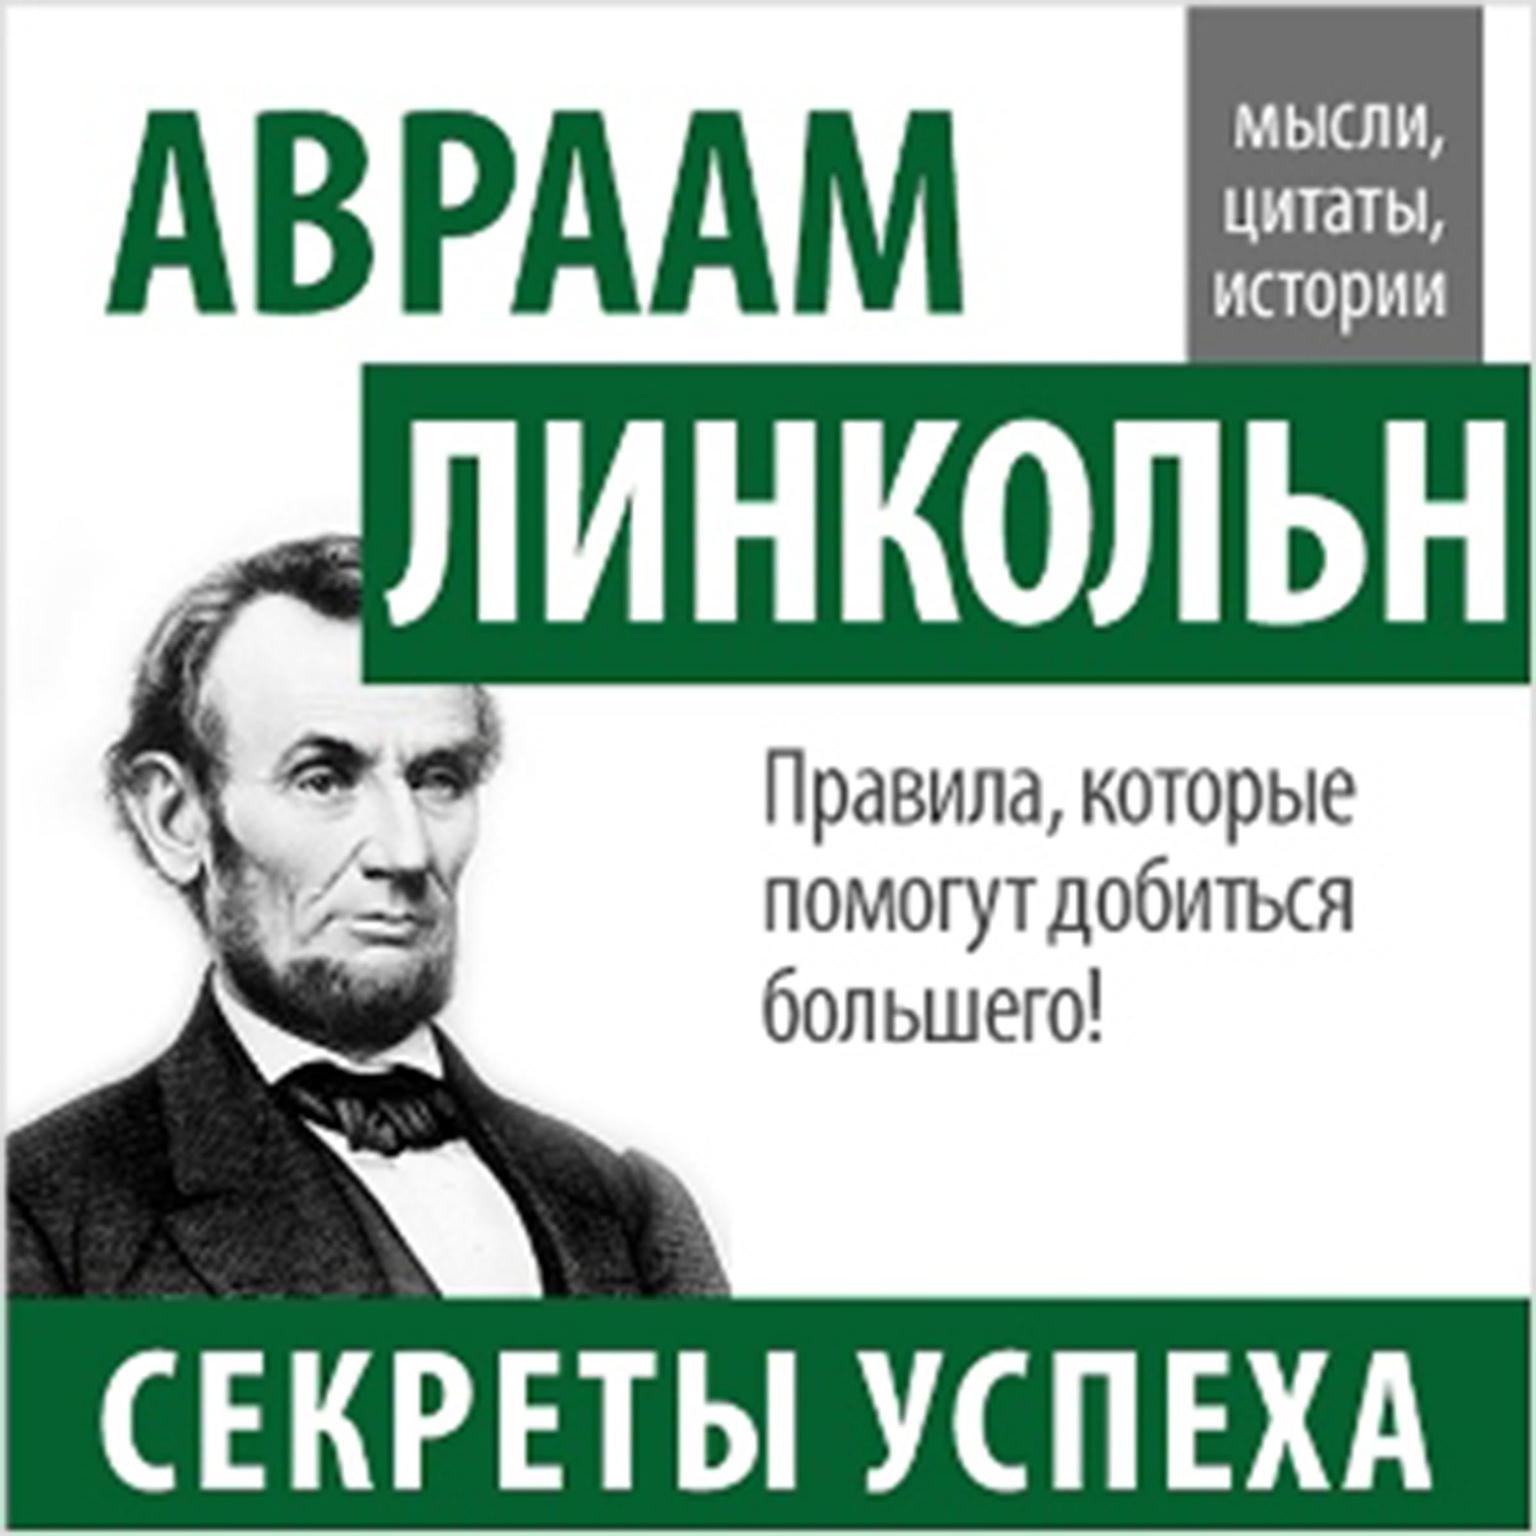 Abraham Lincoln: Secrets of Success [Russian Edition] Audiobook, by John Bowerman